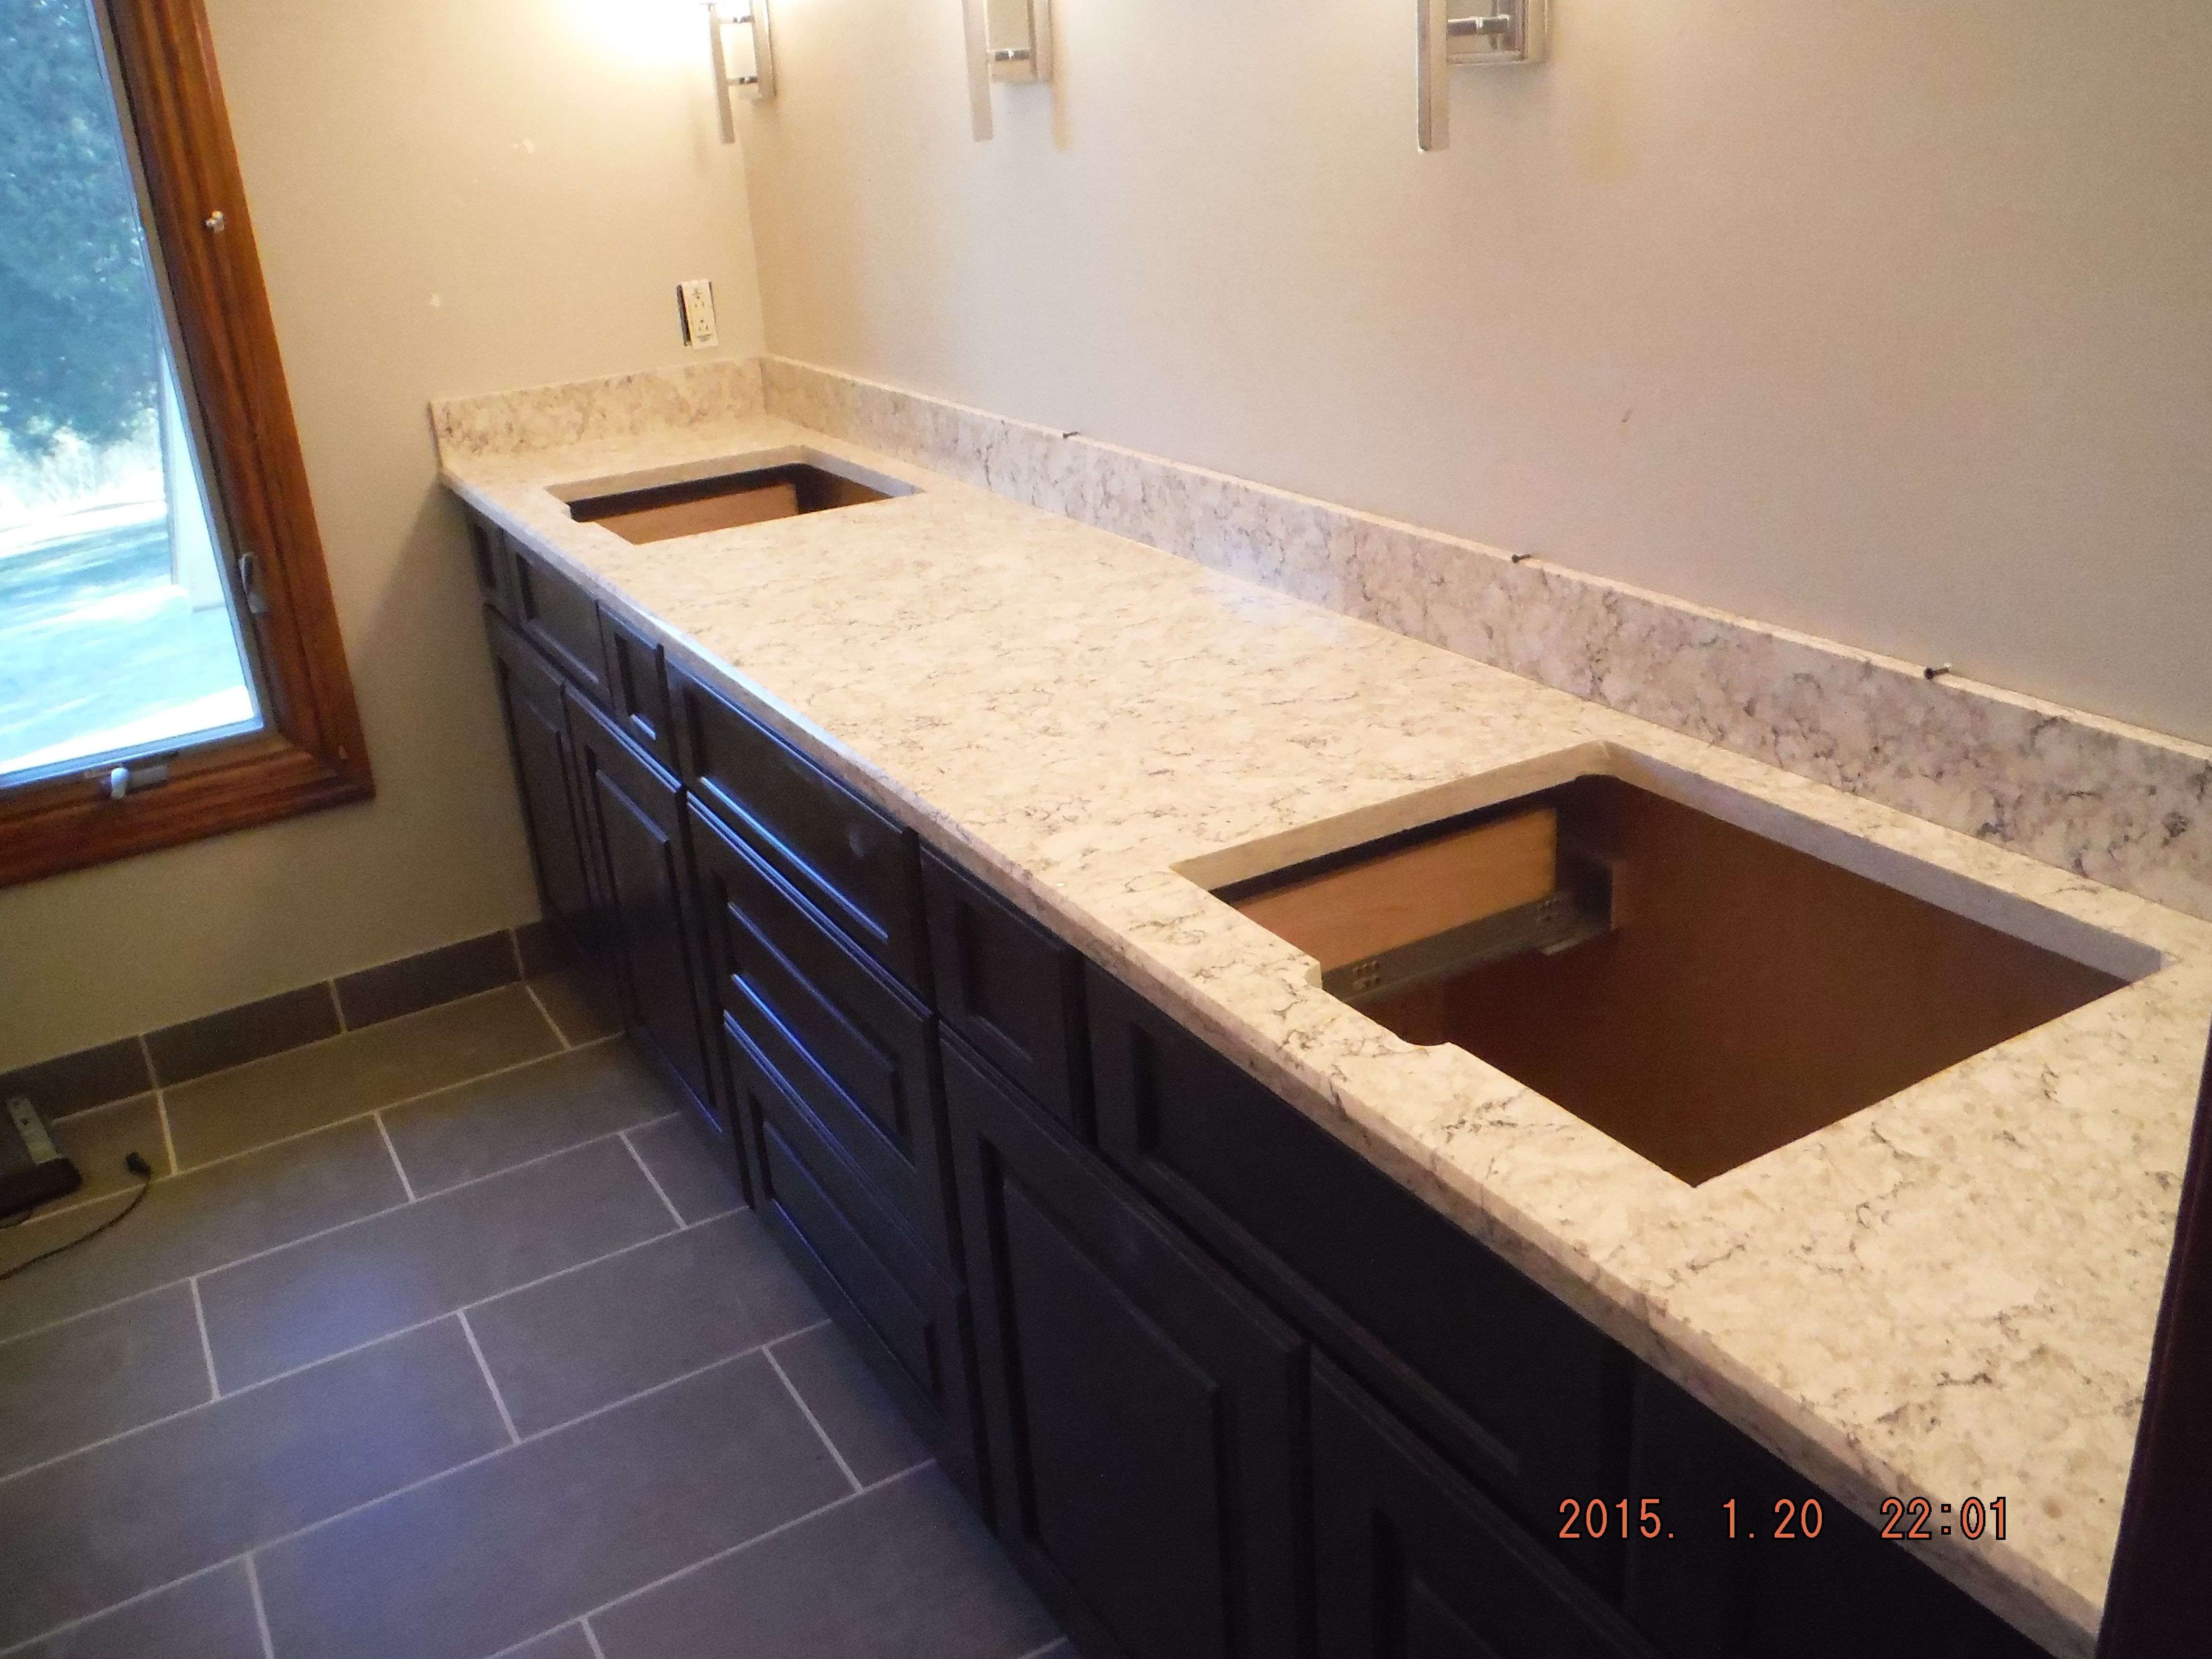 Great LG Viatera Aria Quartz Kitchen Install For The Foster Family. Knoxvilleu0027s  Stone Interiors. Showroom